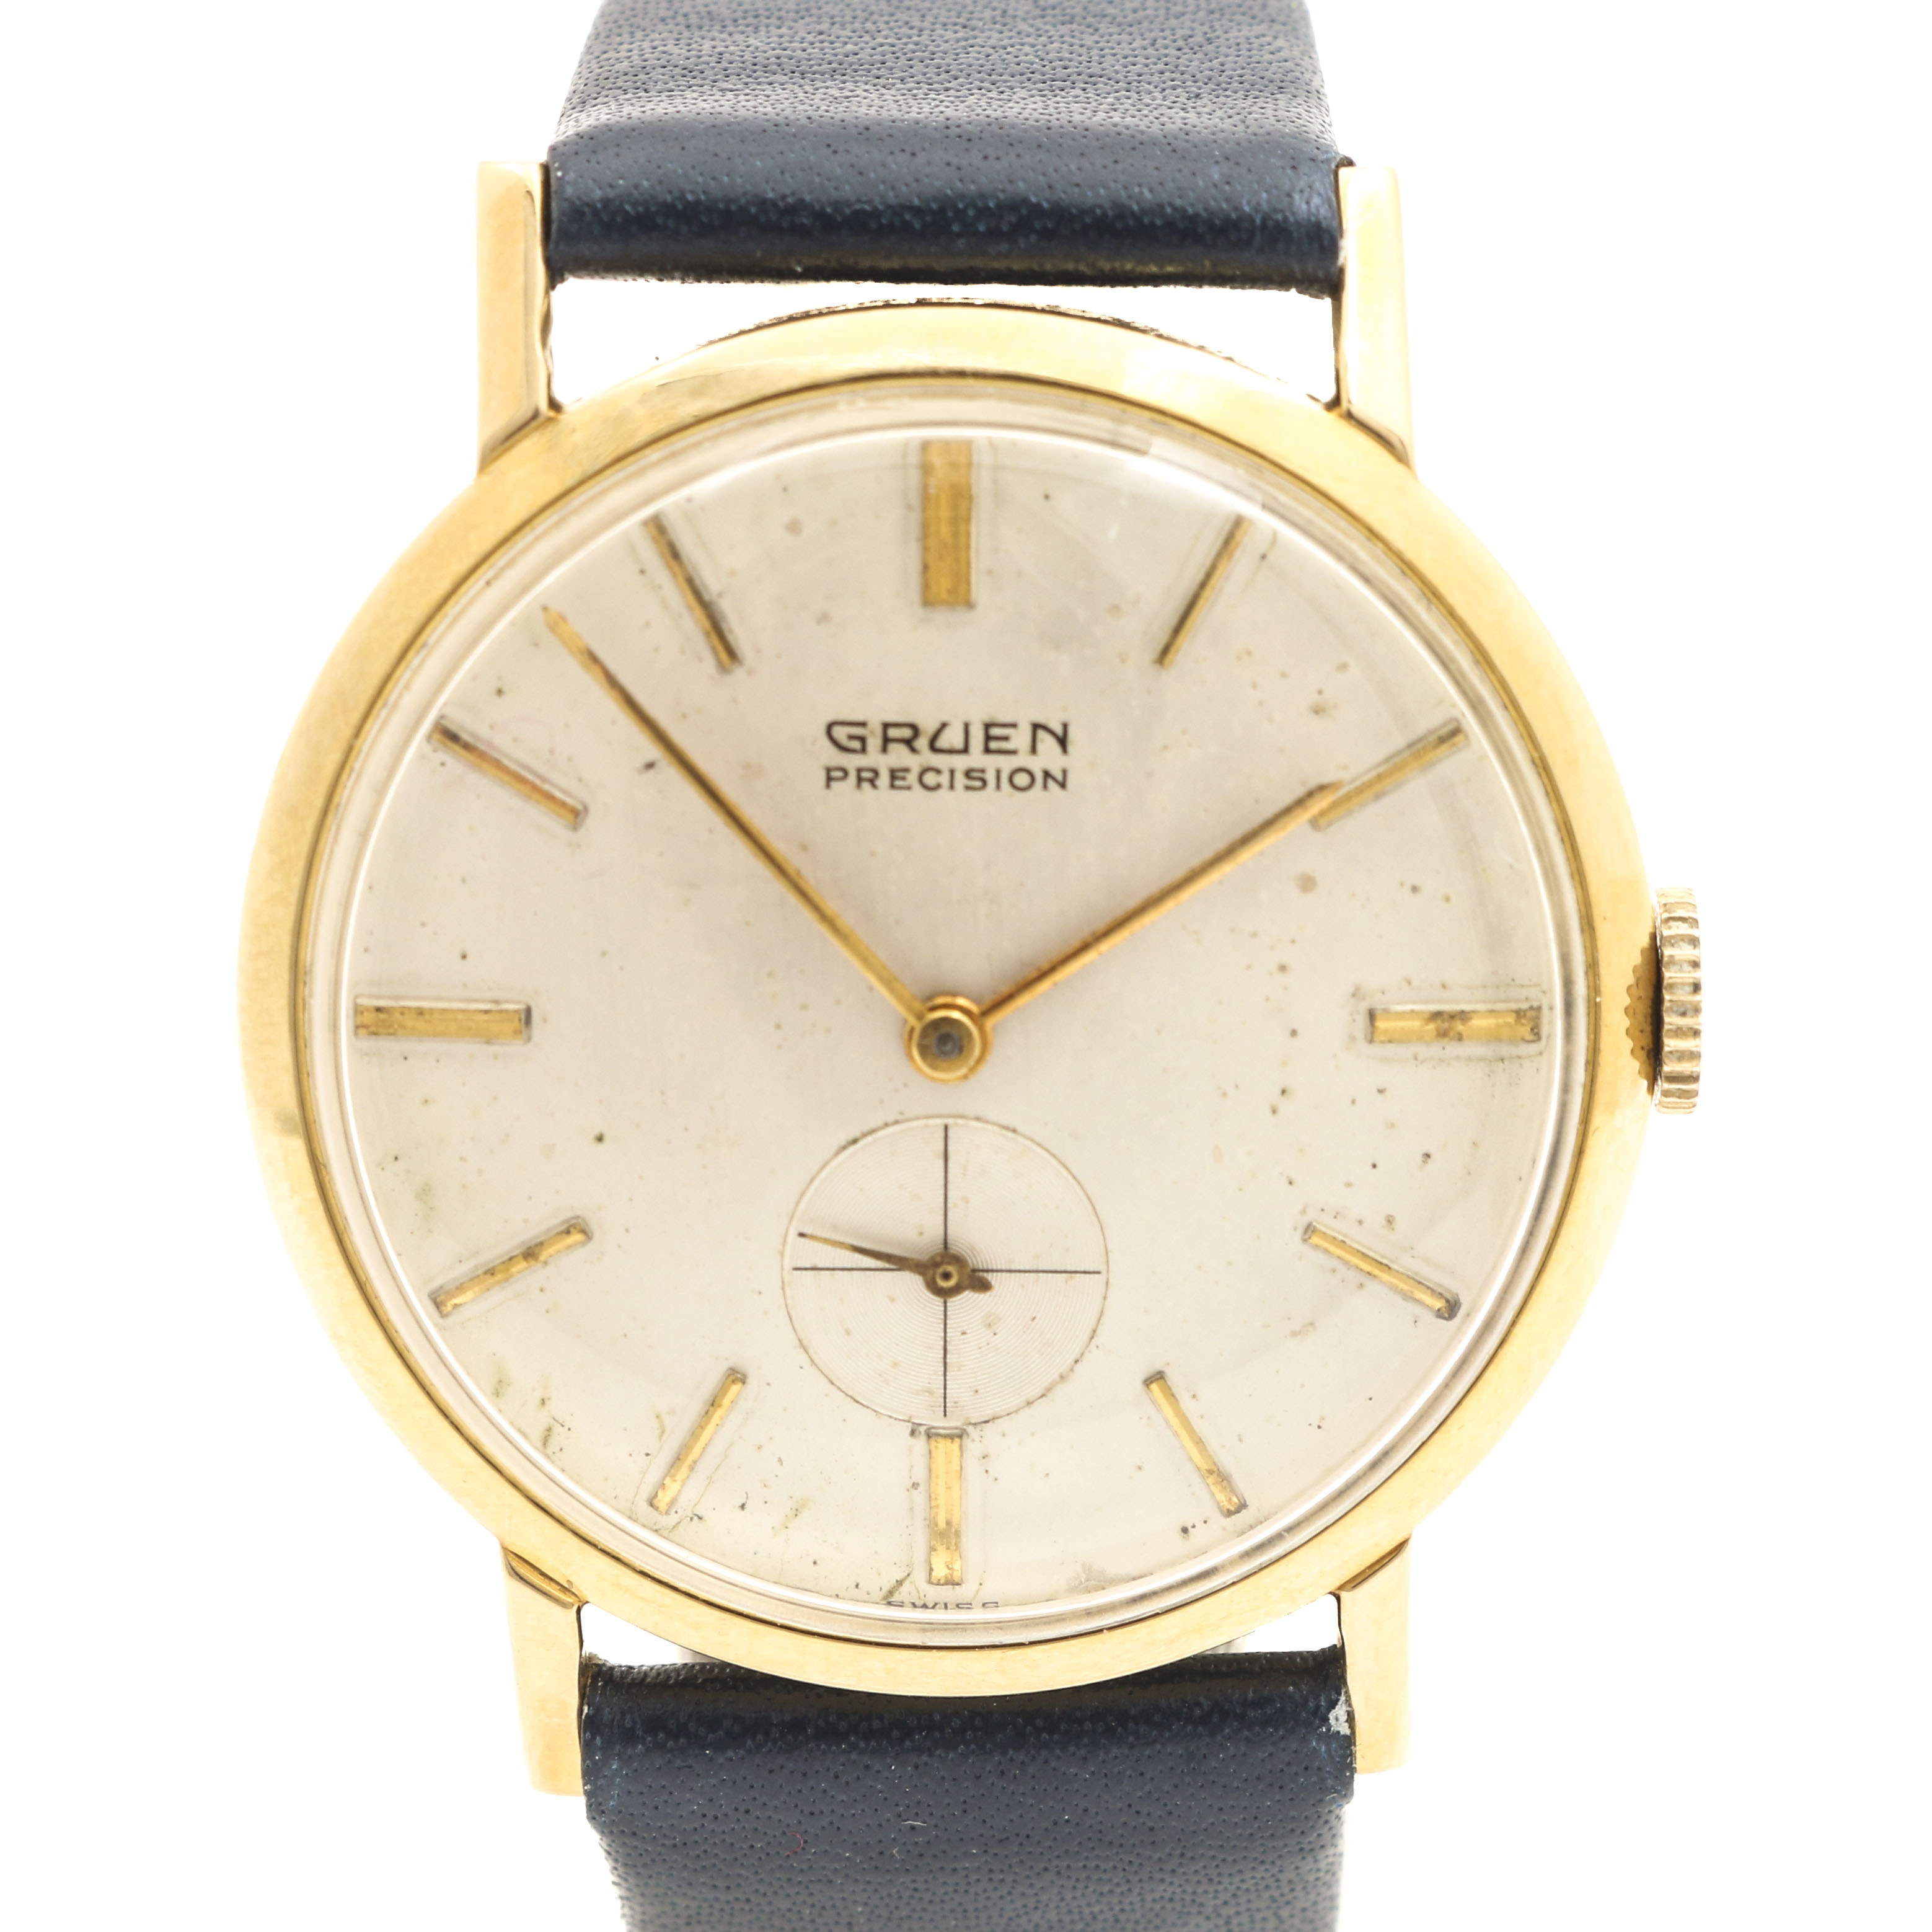 14K Yellow Gold Gruen Precision Wristwatch